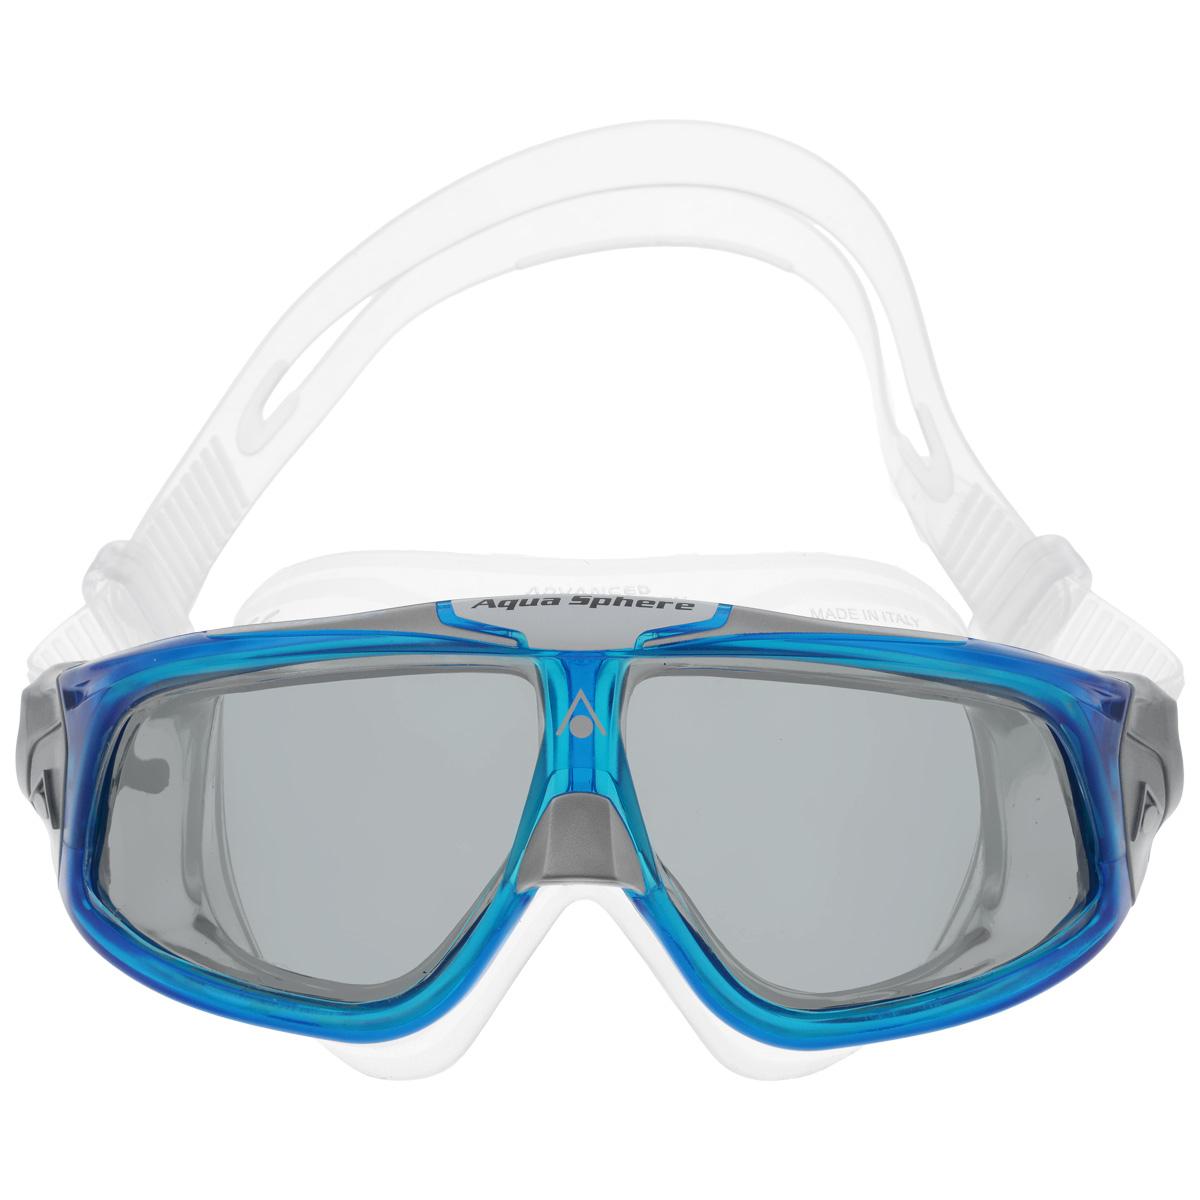 "Очки для плавания Aqua Sphere ""Seal 2.0"", цвет: прозрачный, синий"